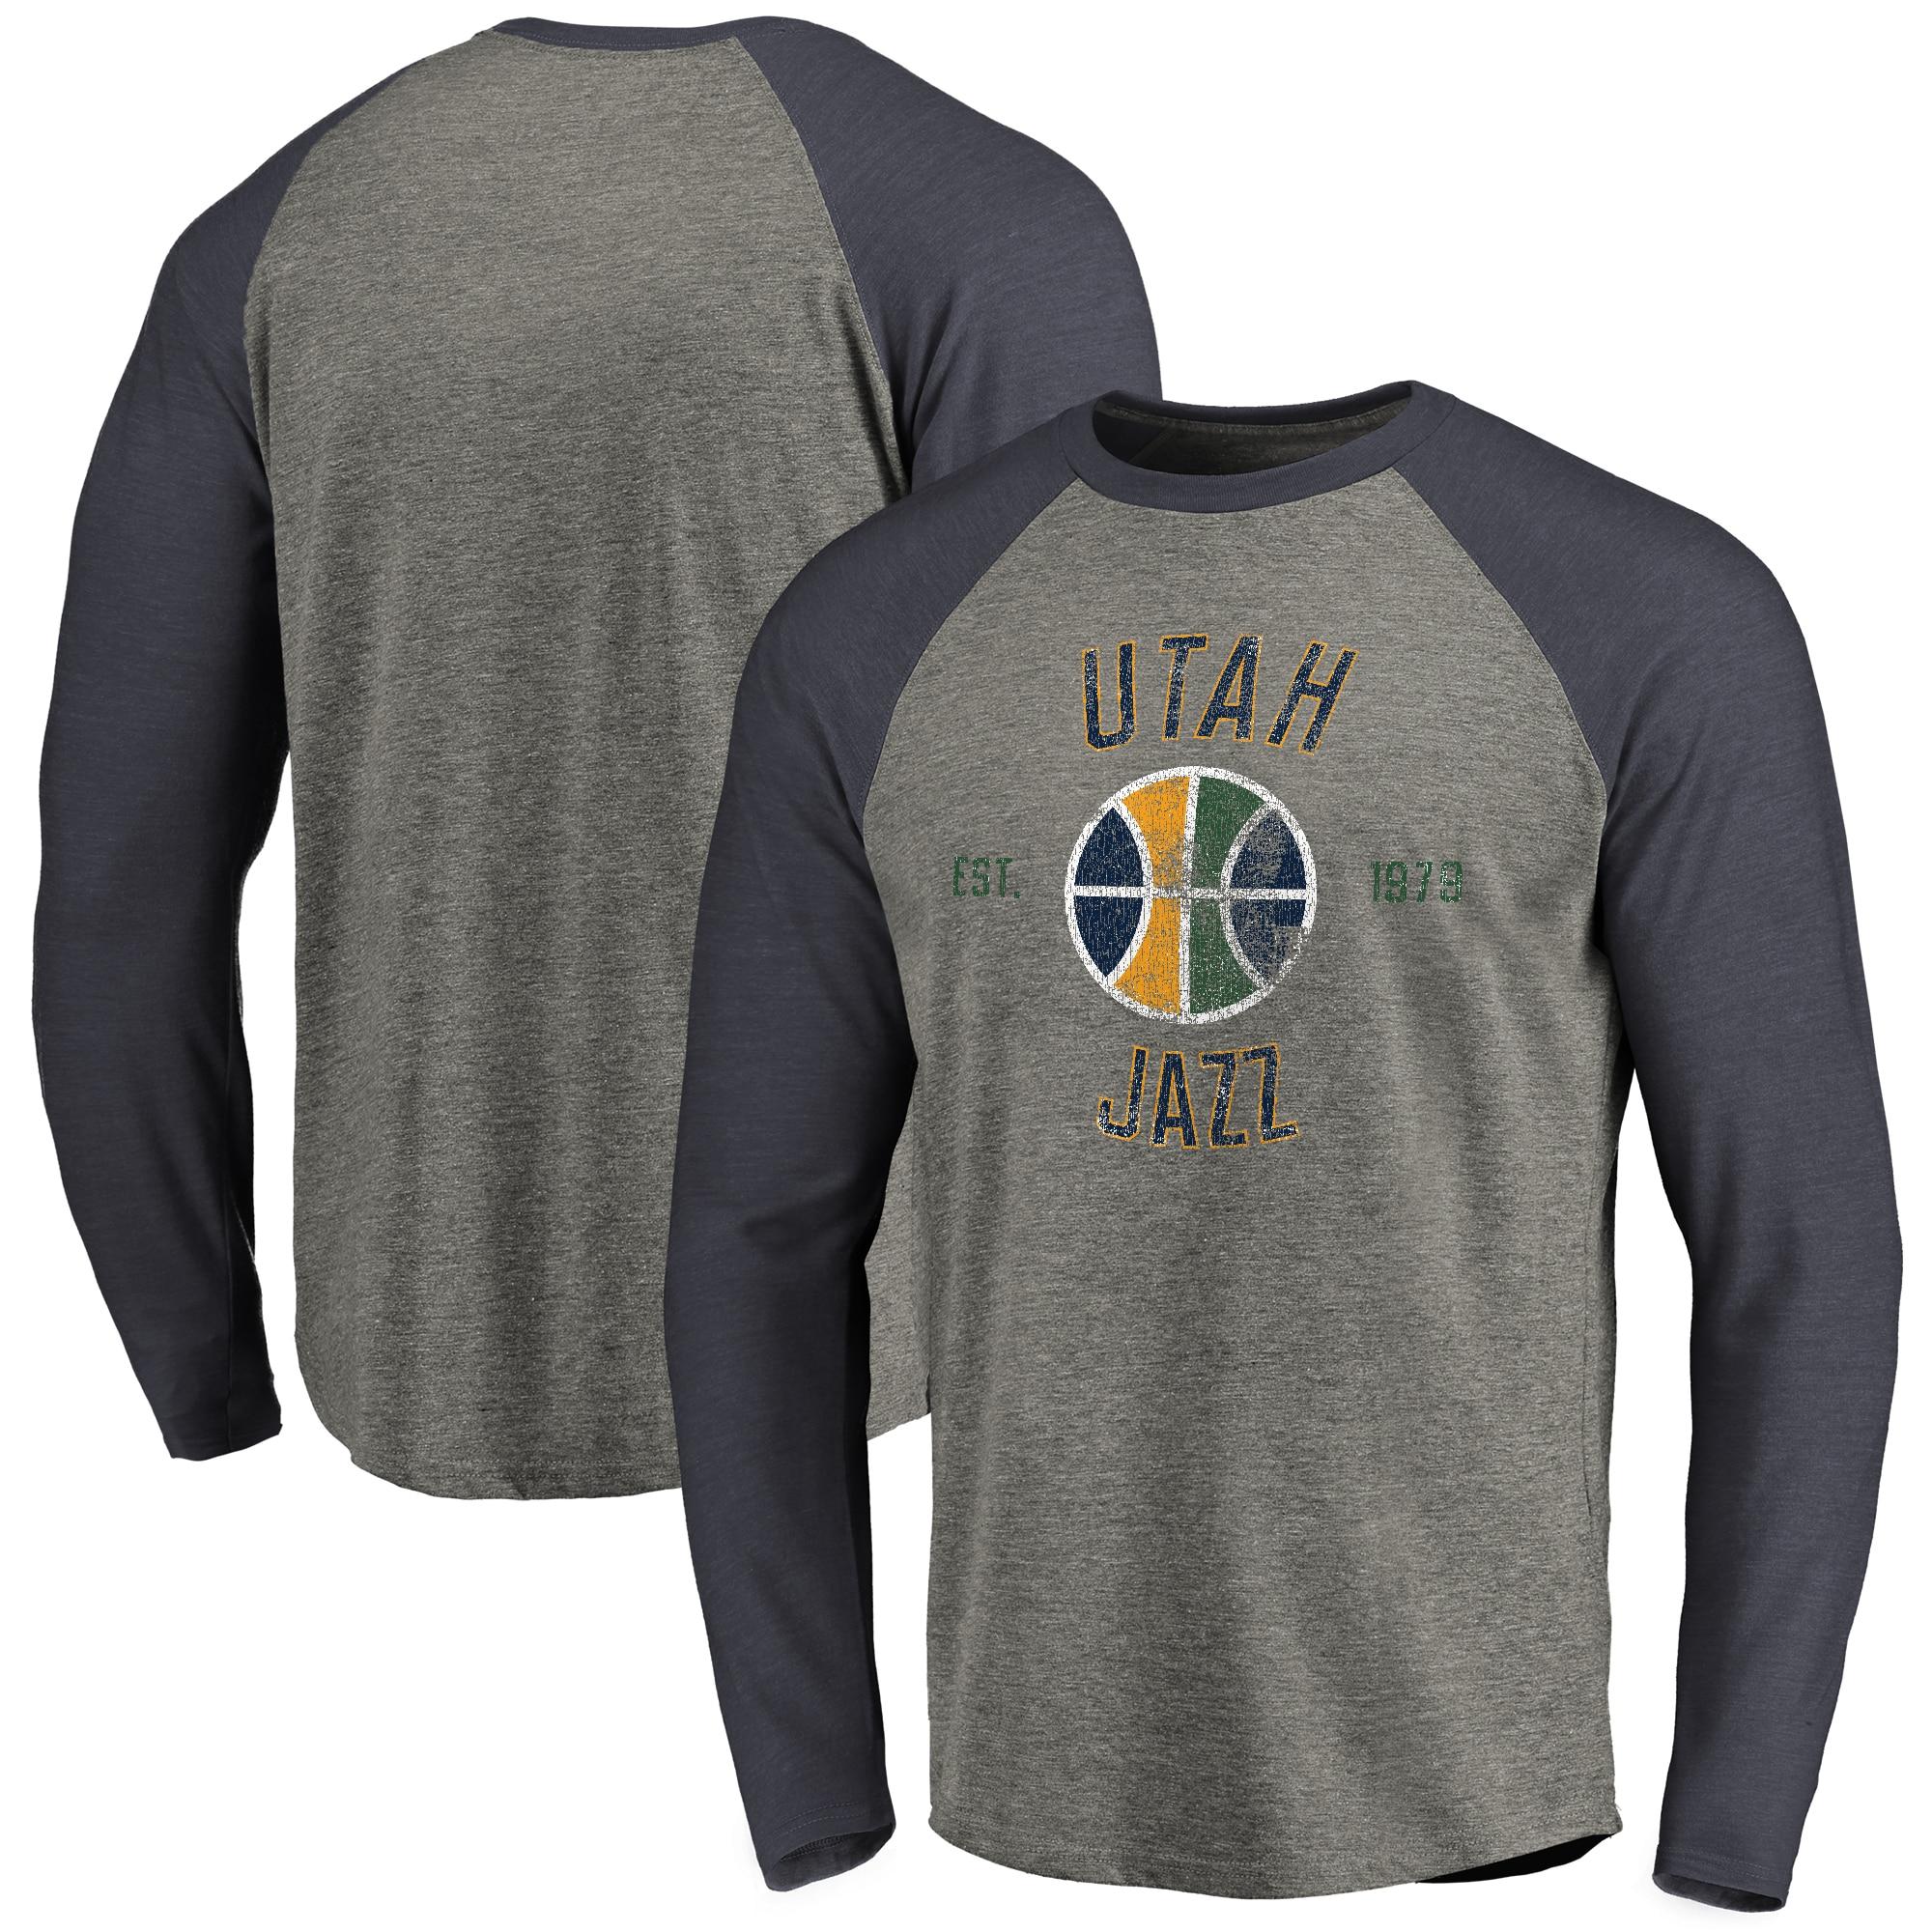 Utah Jazz Fanatics Branded Heritage Long Sleeve Raglan T-Shirt - Heathered Gray